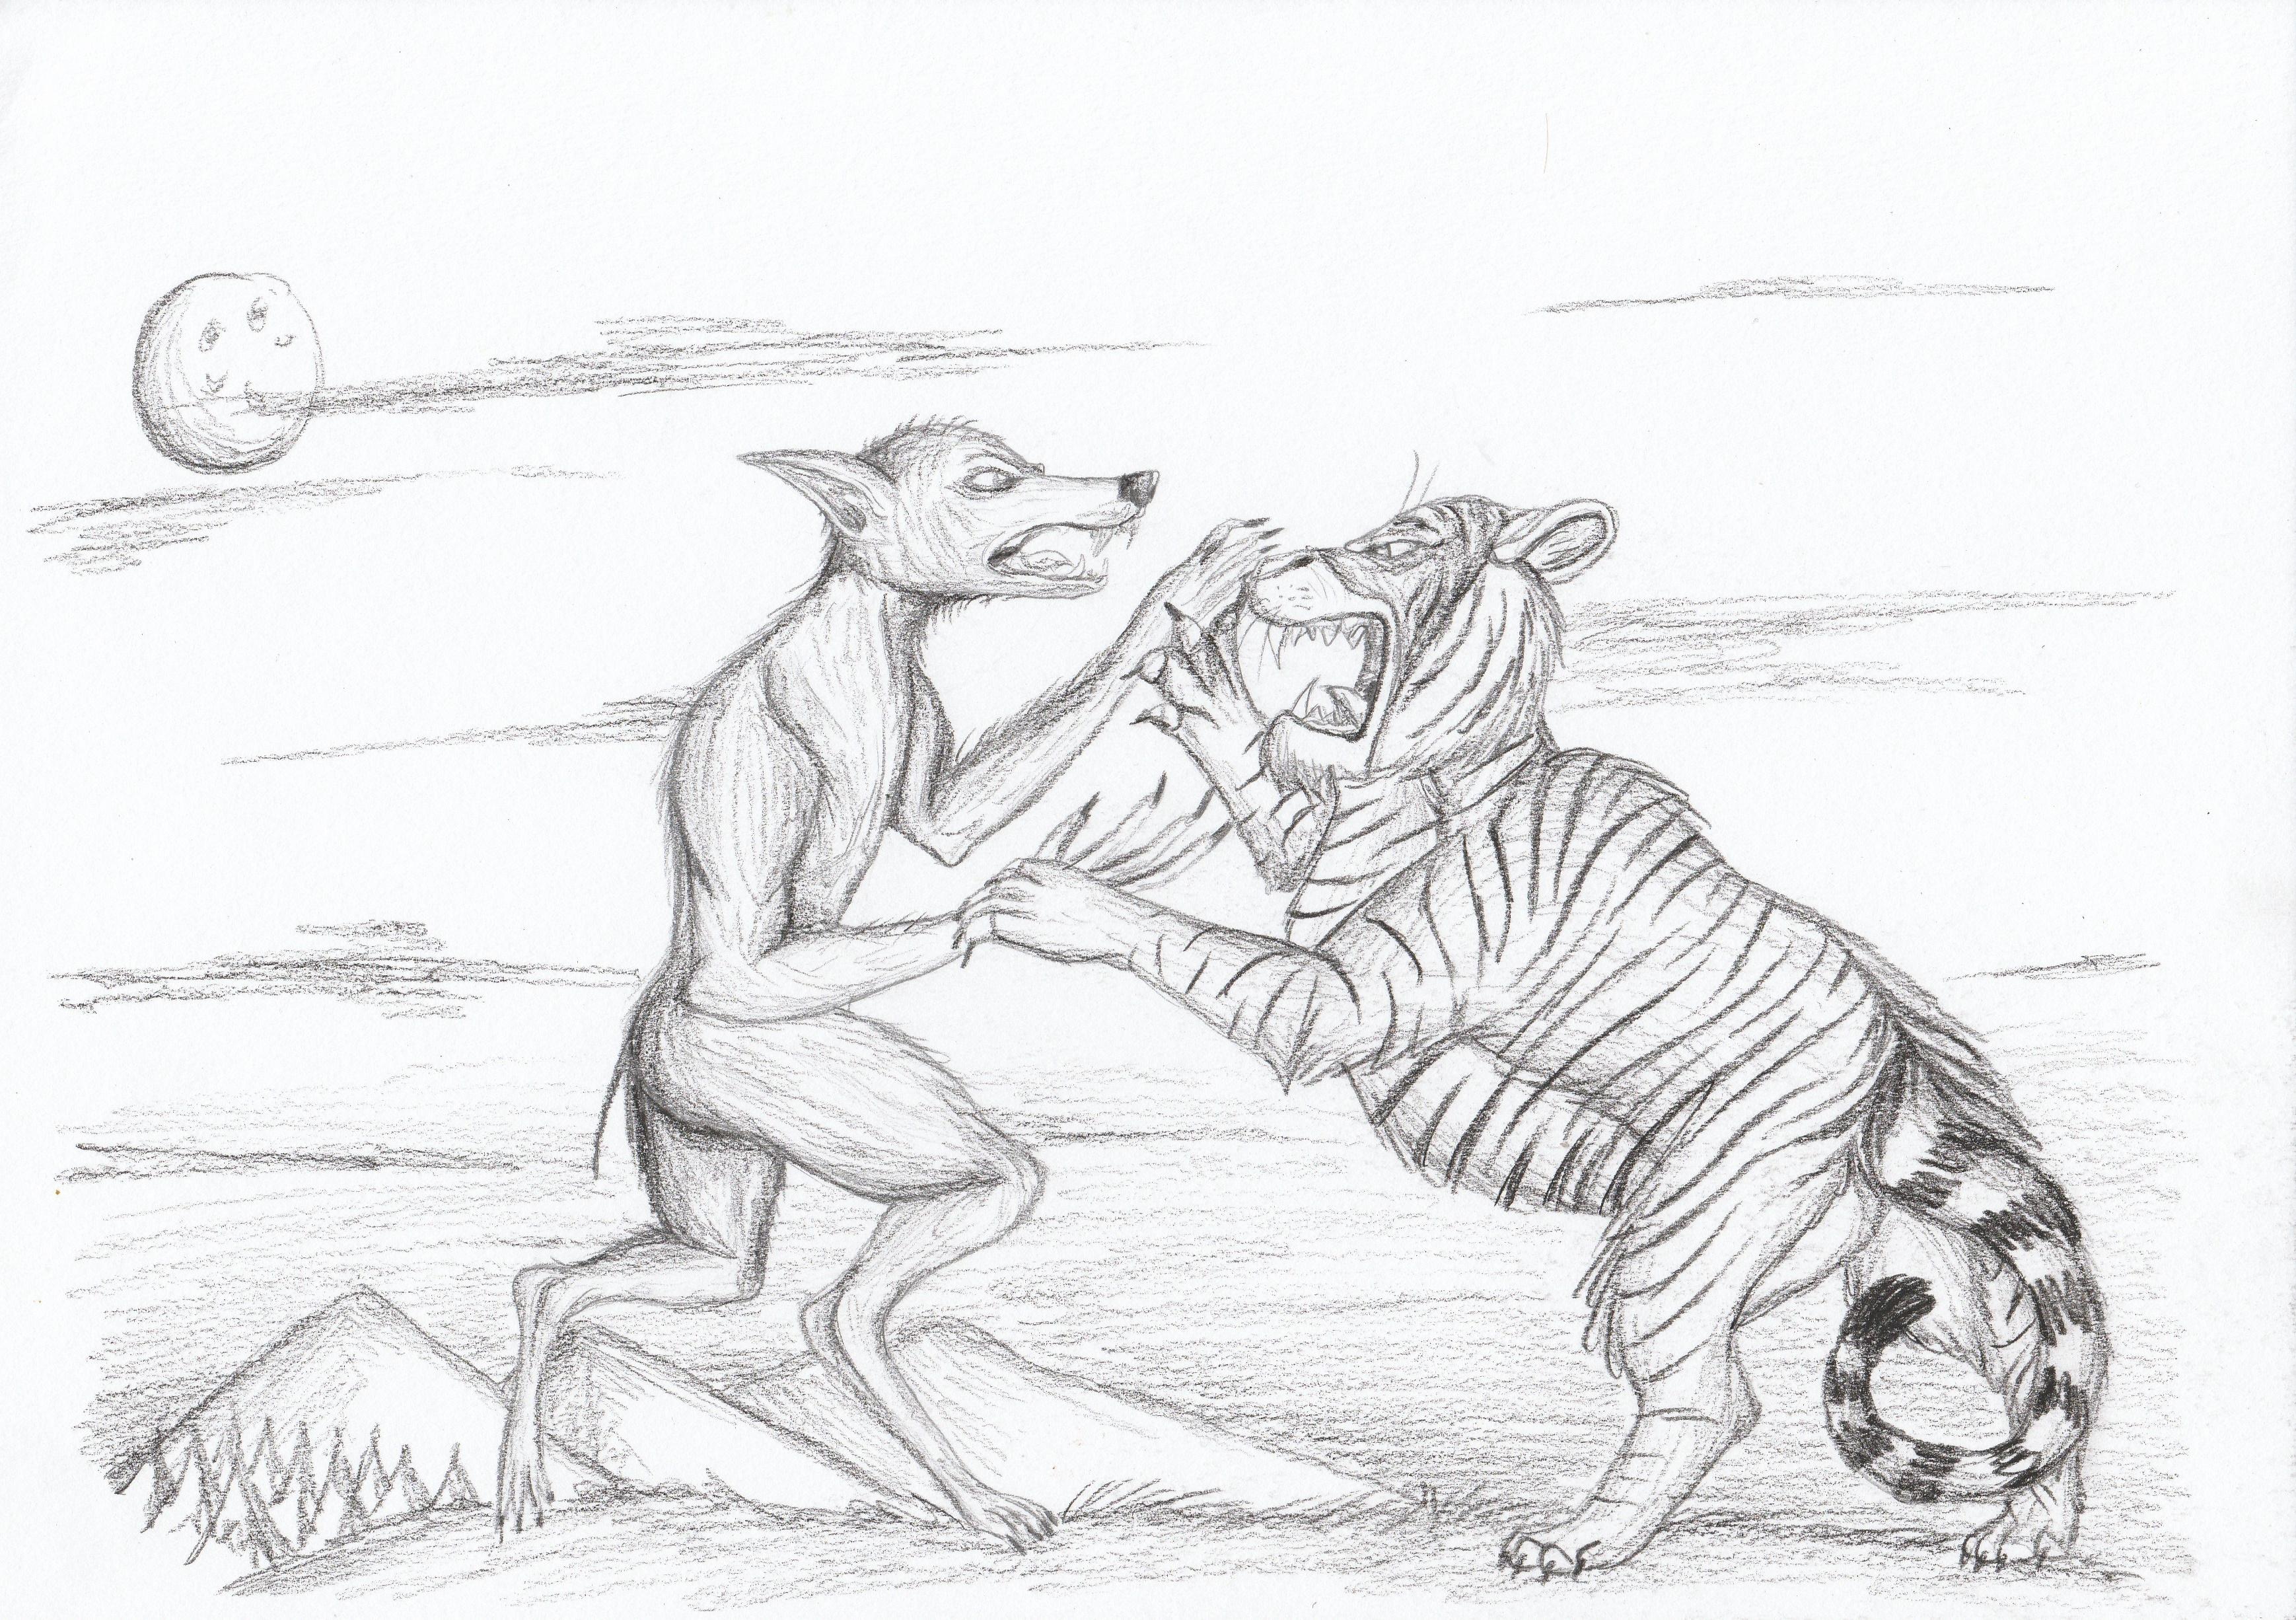 Werewolf vs Tiger by Louisetheanimator